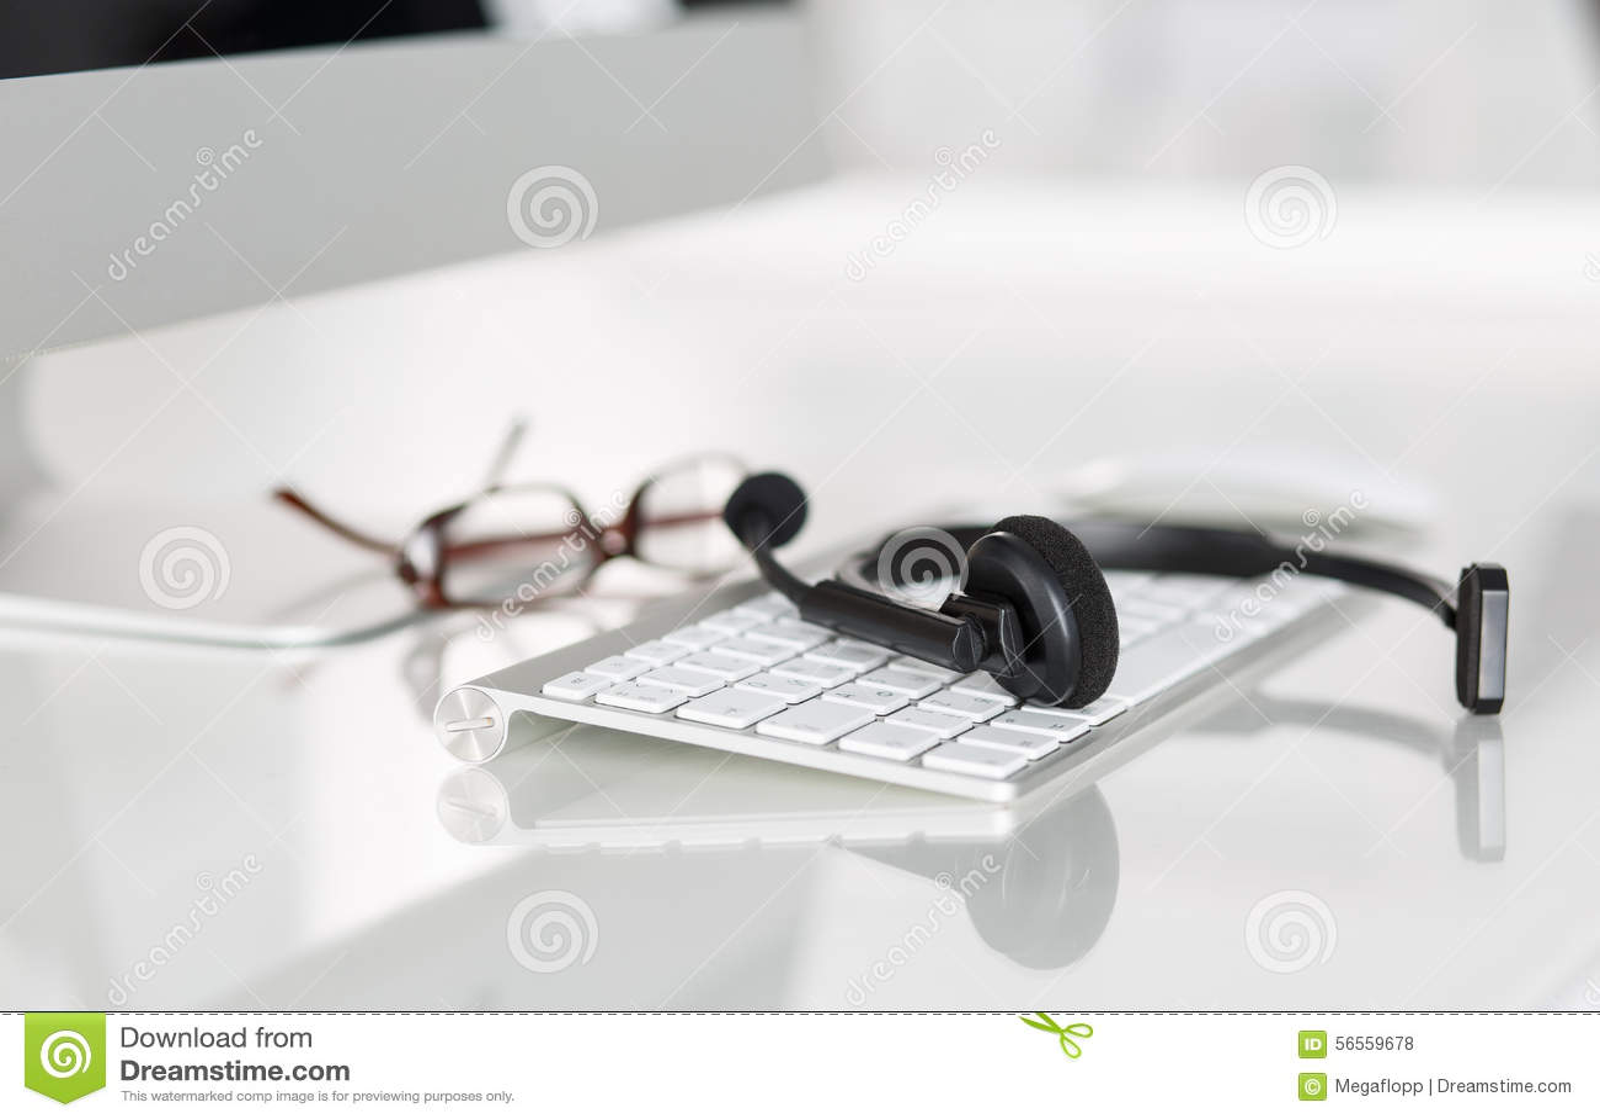 Download Κενή θέση εργασίας του χειριστή υπηρεσιών τηλεφωνικών κέντρων Στοκ Εικόνες - εικόνα από υπάλληλος, κενός: 56559678